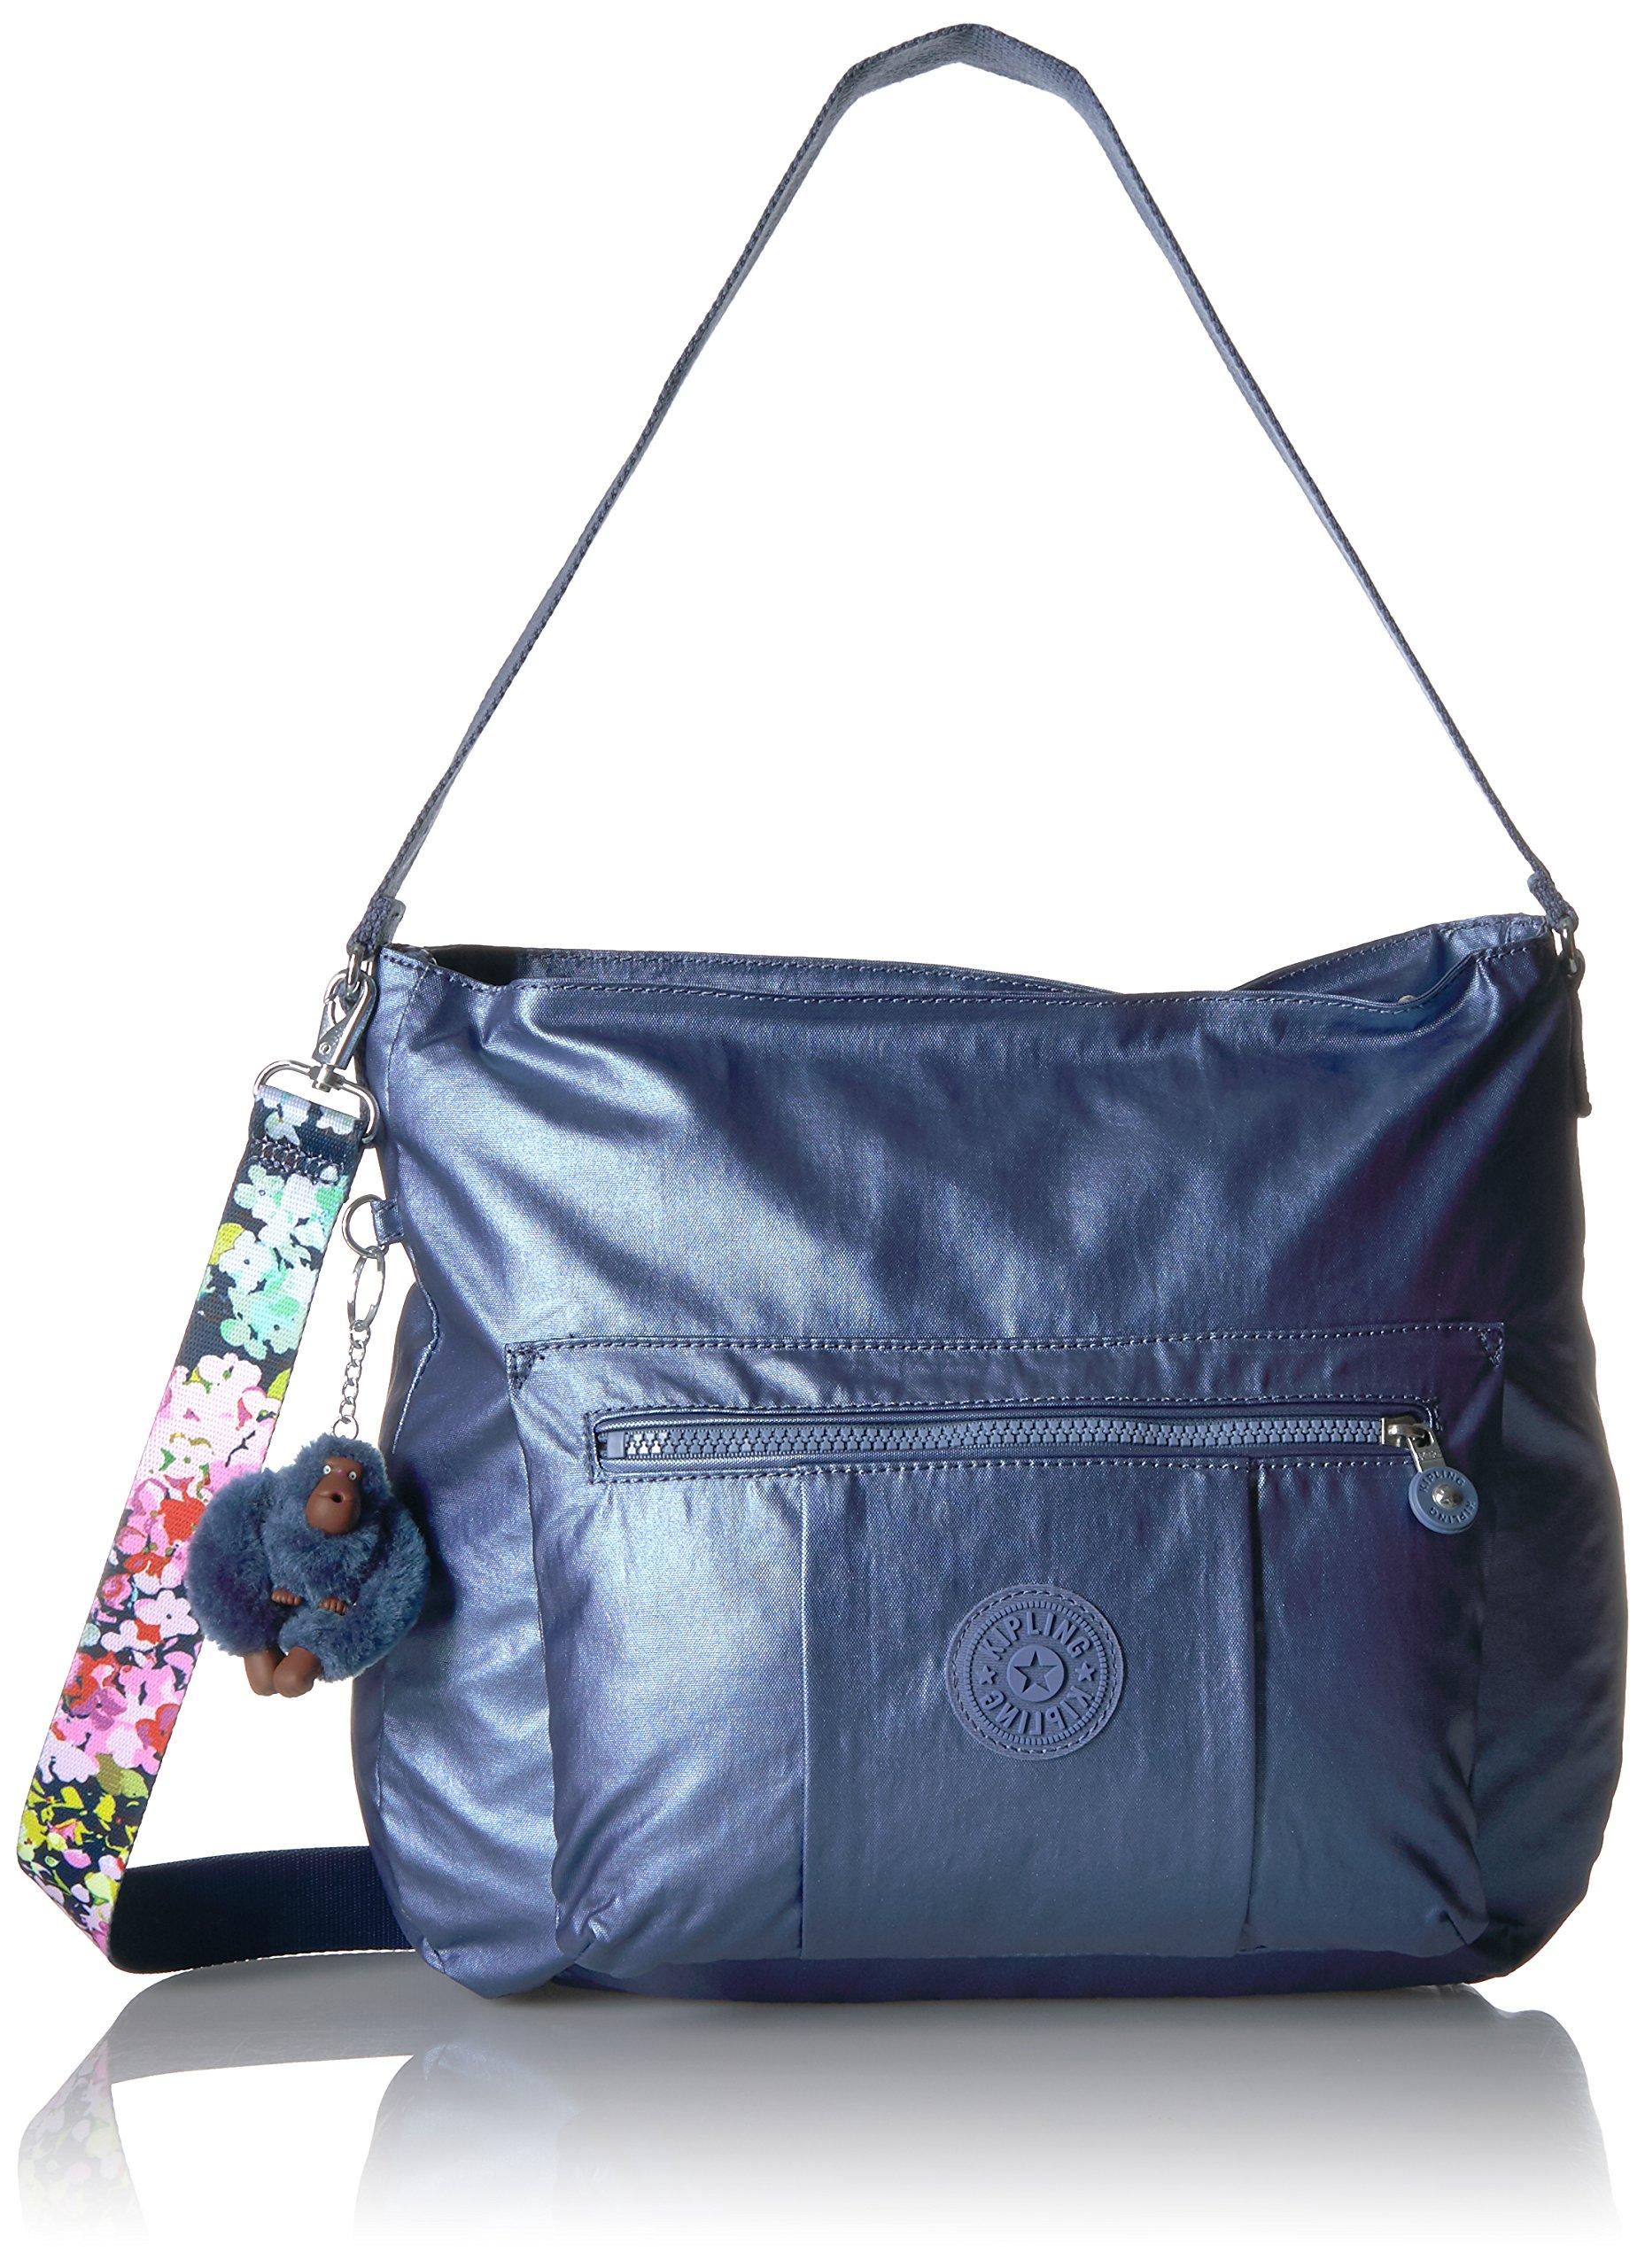 Kipling Carley Metallic Hobo Crossbody Bag with a Floral Printed Strap, Mtlcsubdvb